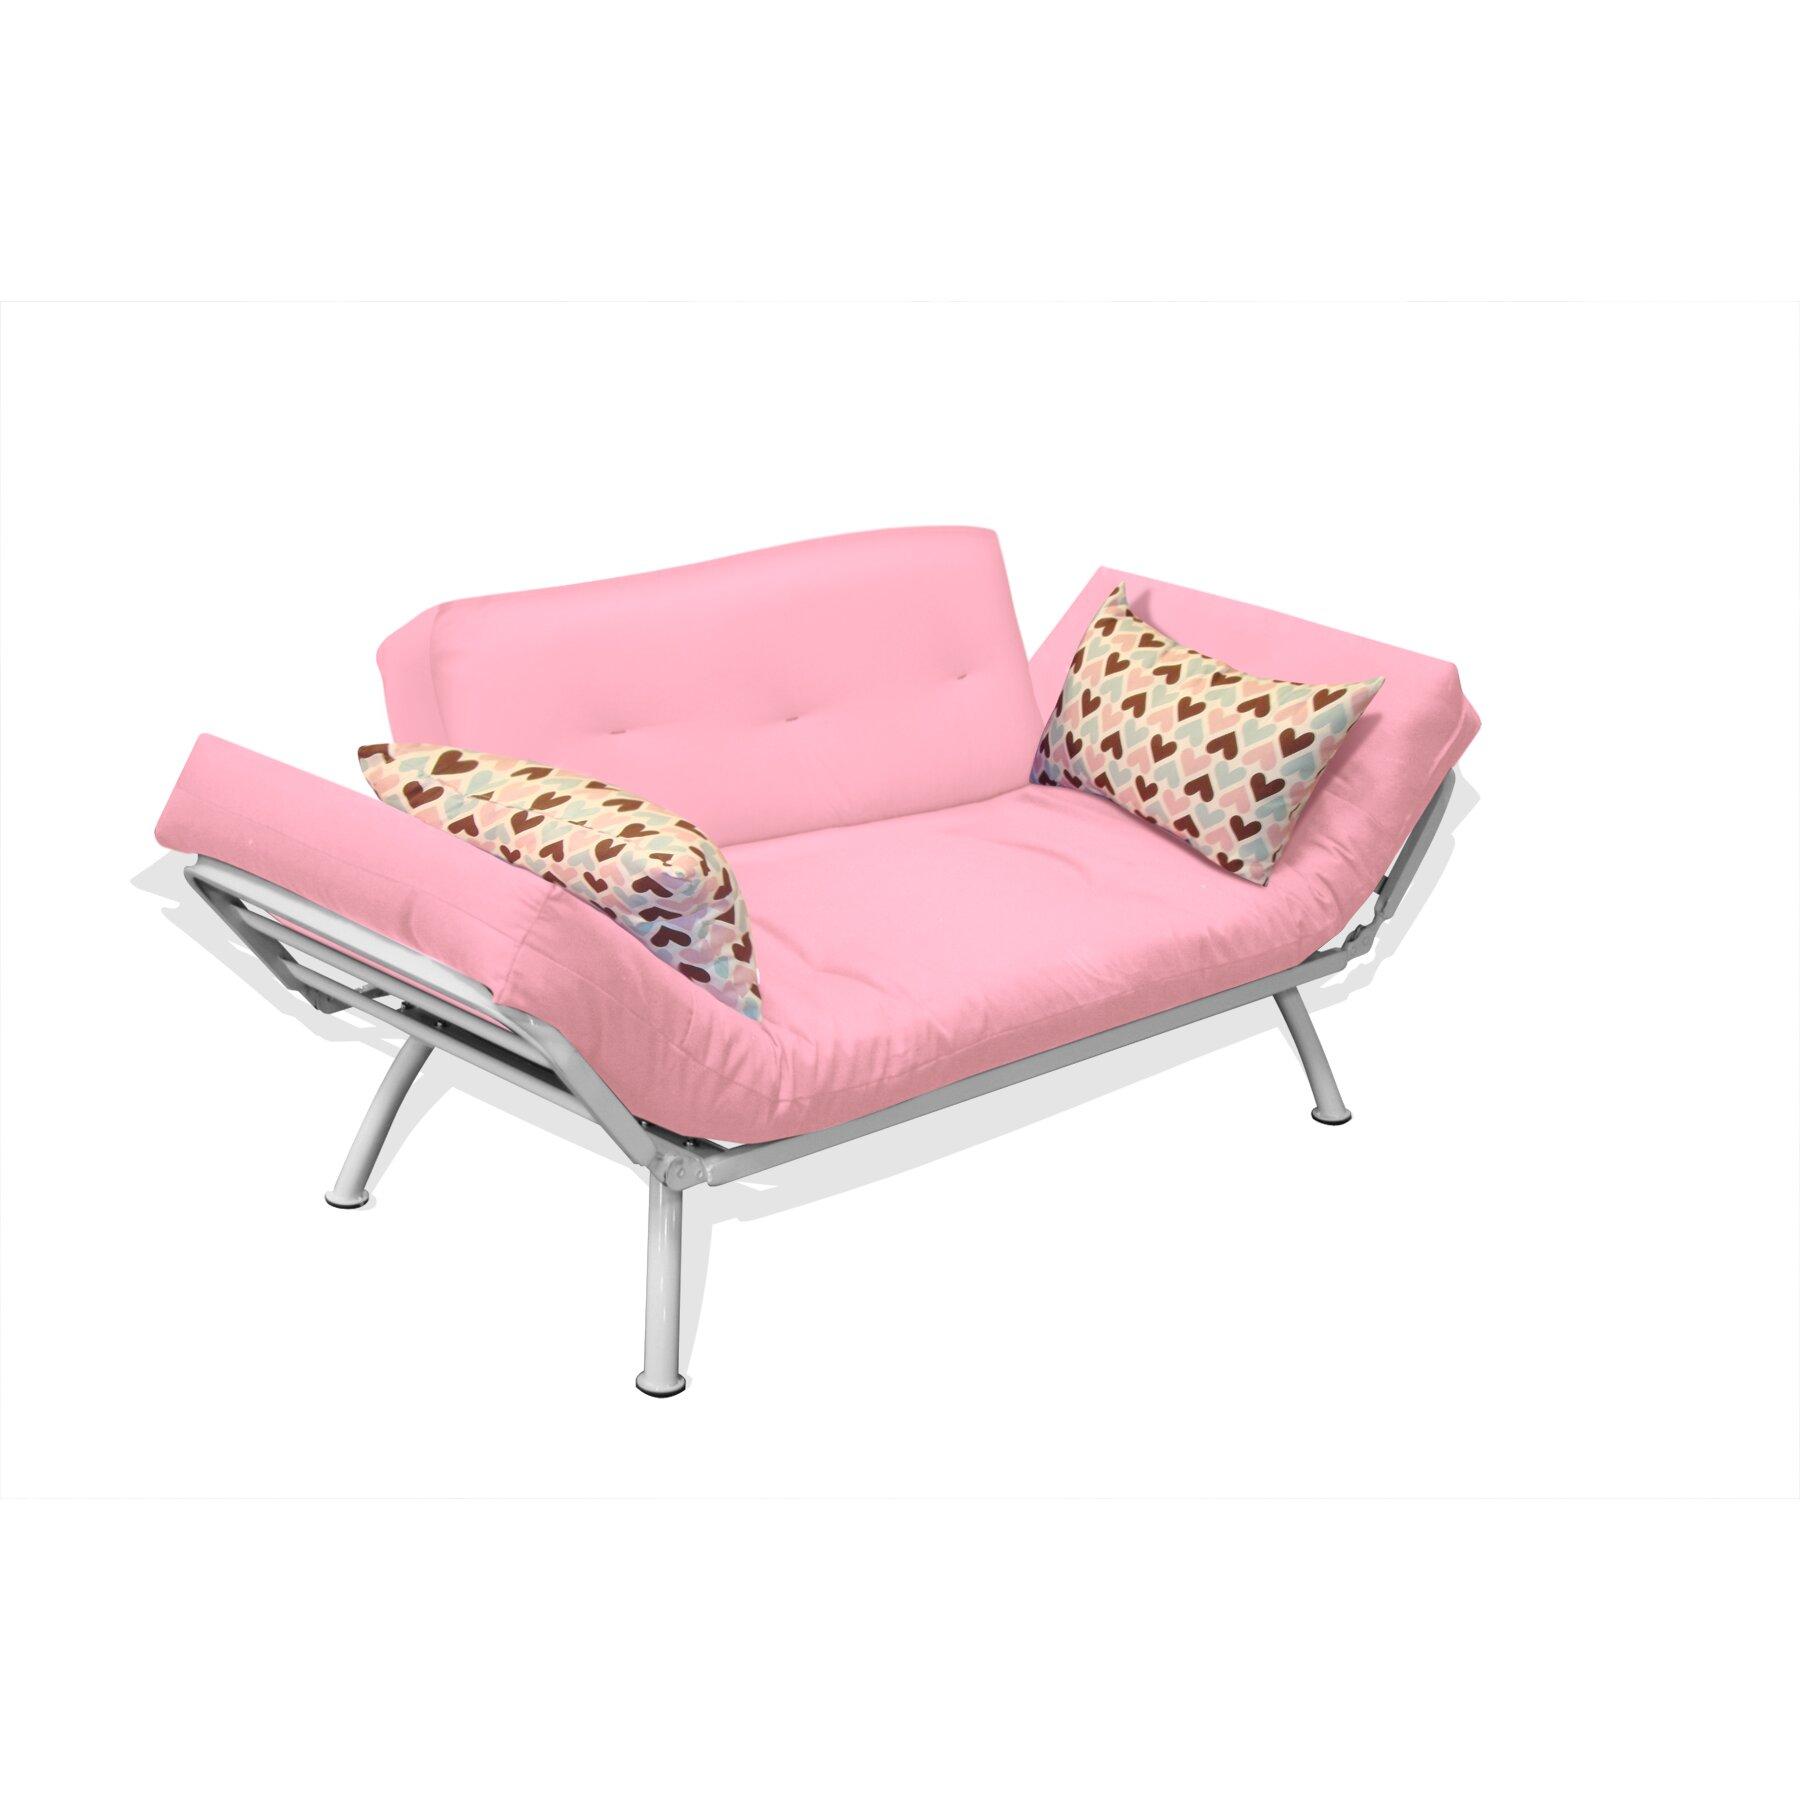 elite products modern loft mali flex  bo futon and mattress elite products futon   roselawnlutheran  rh   roselawnlutheran org